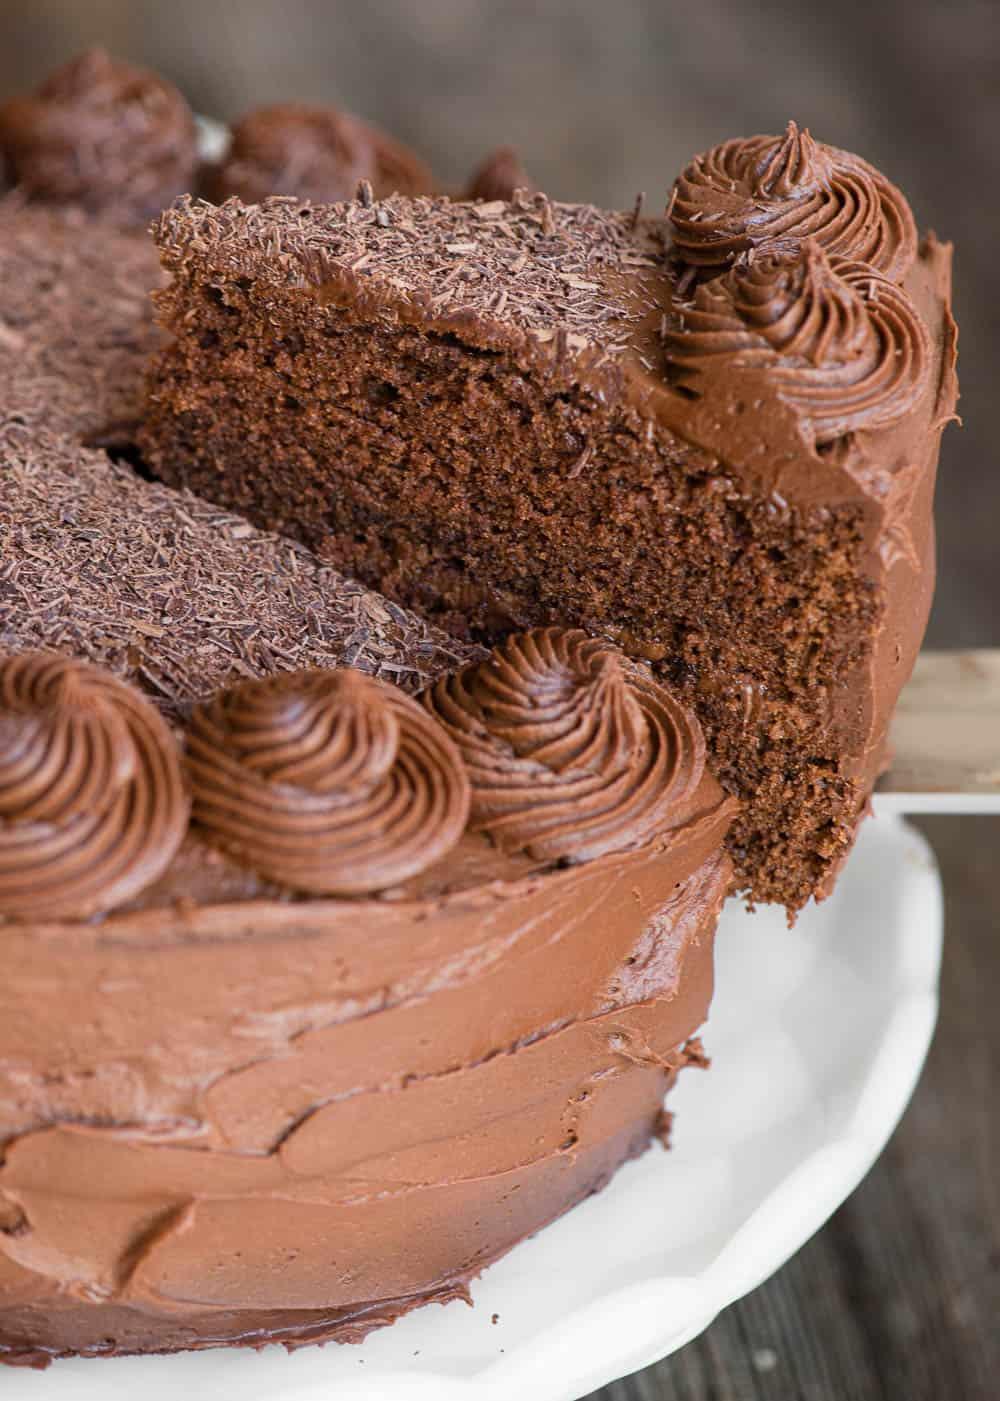 lifting a piece of cake